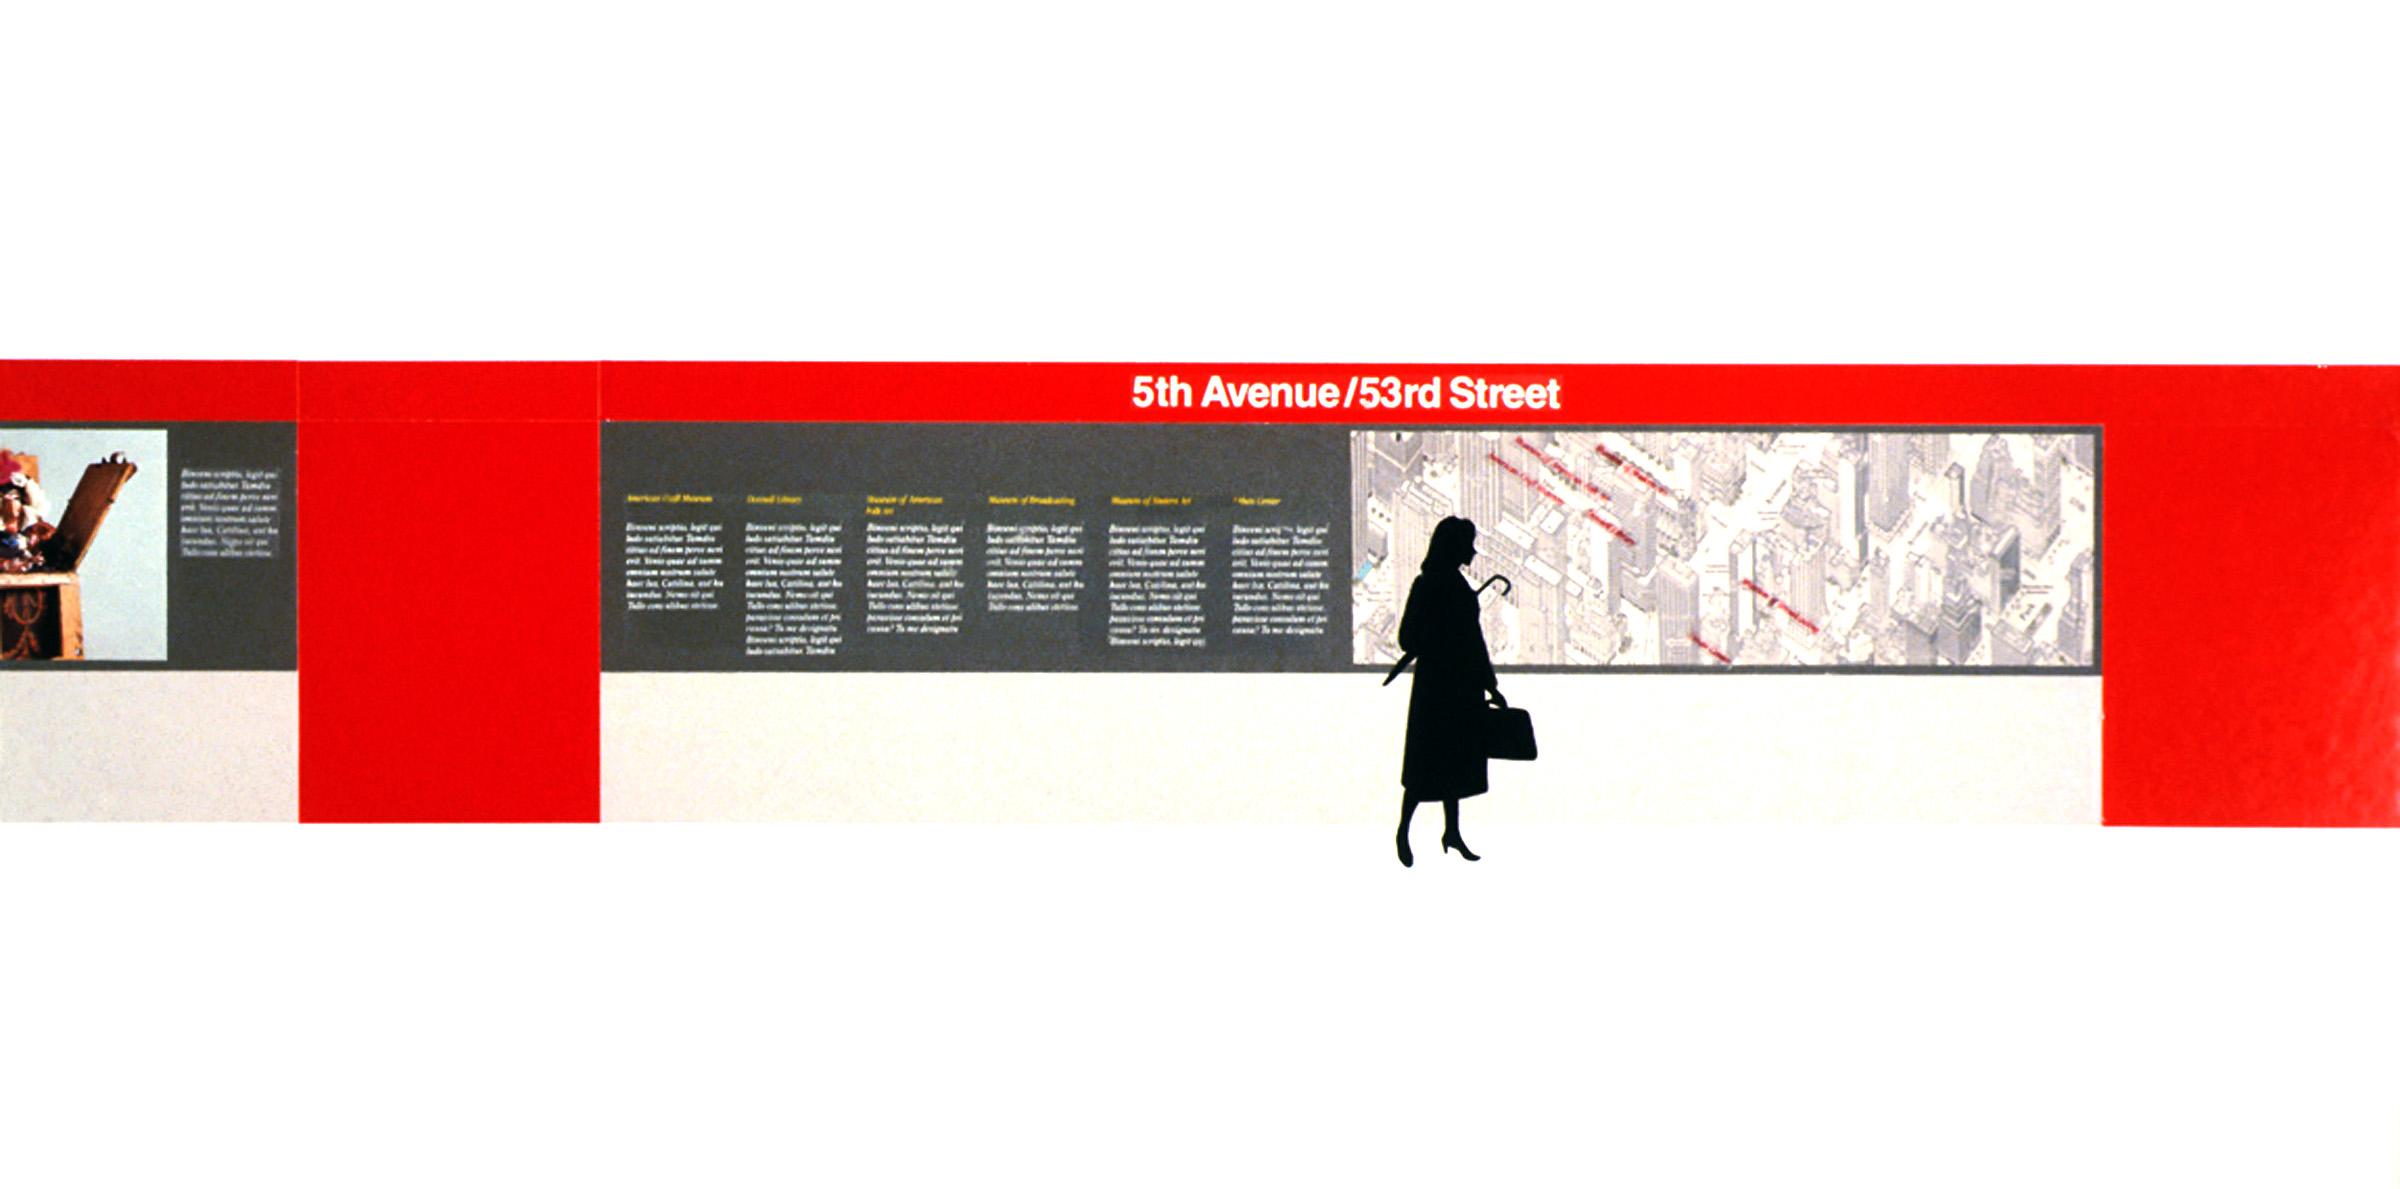 MoMA - Platform Wall Display 7.jpg